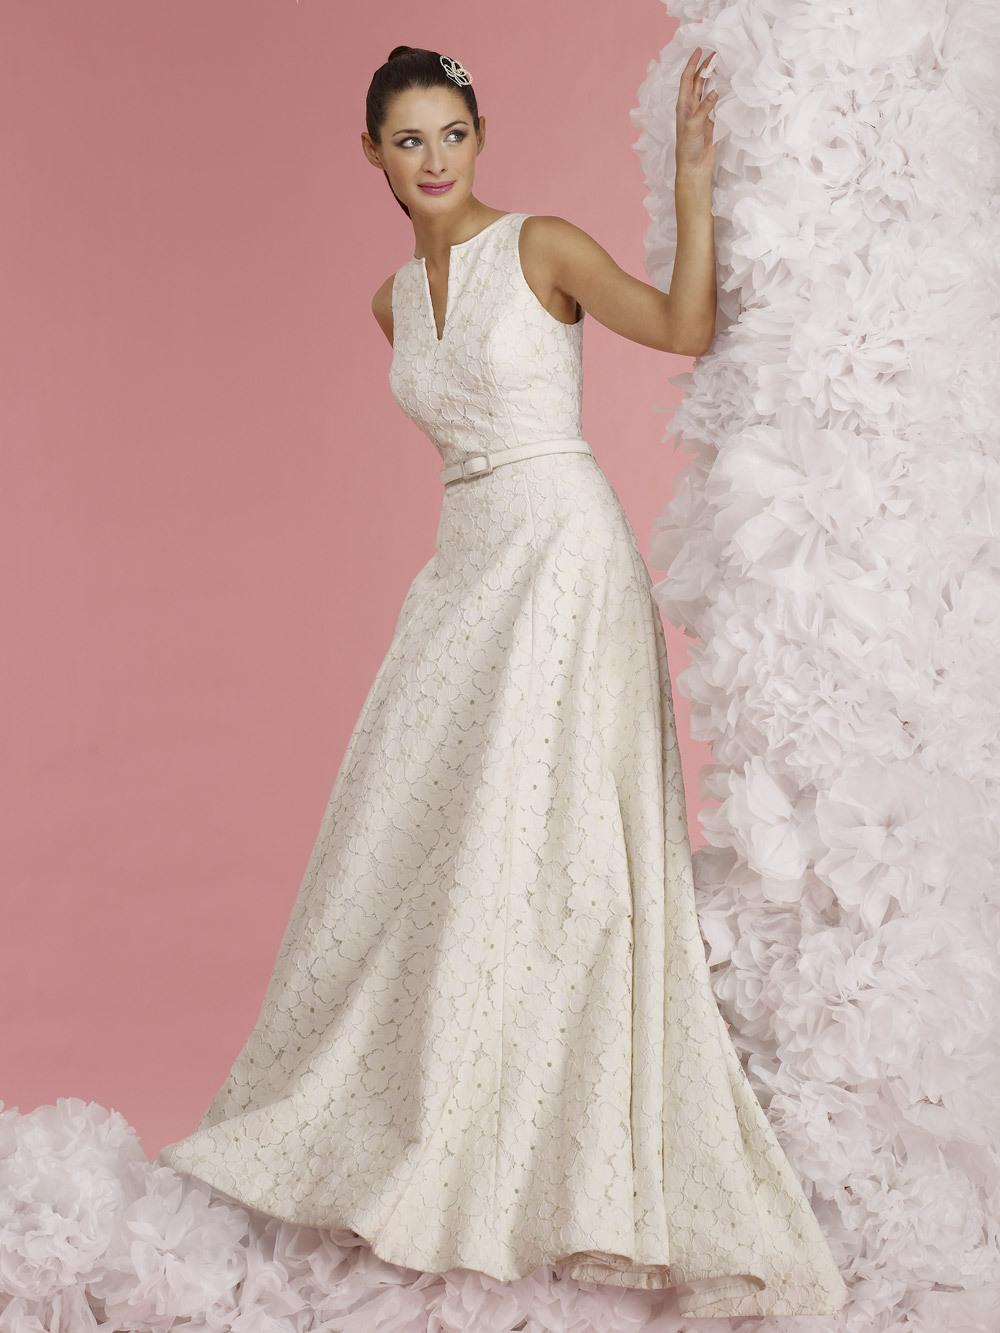 Vintage inspired wedding dress 2012 bridal gowns steven for Antique inspired wedding dresses